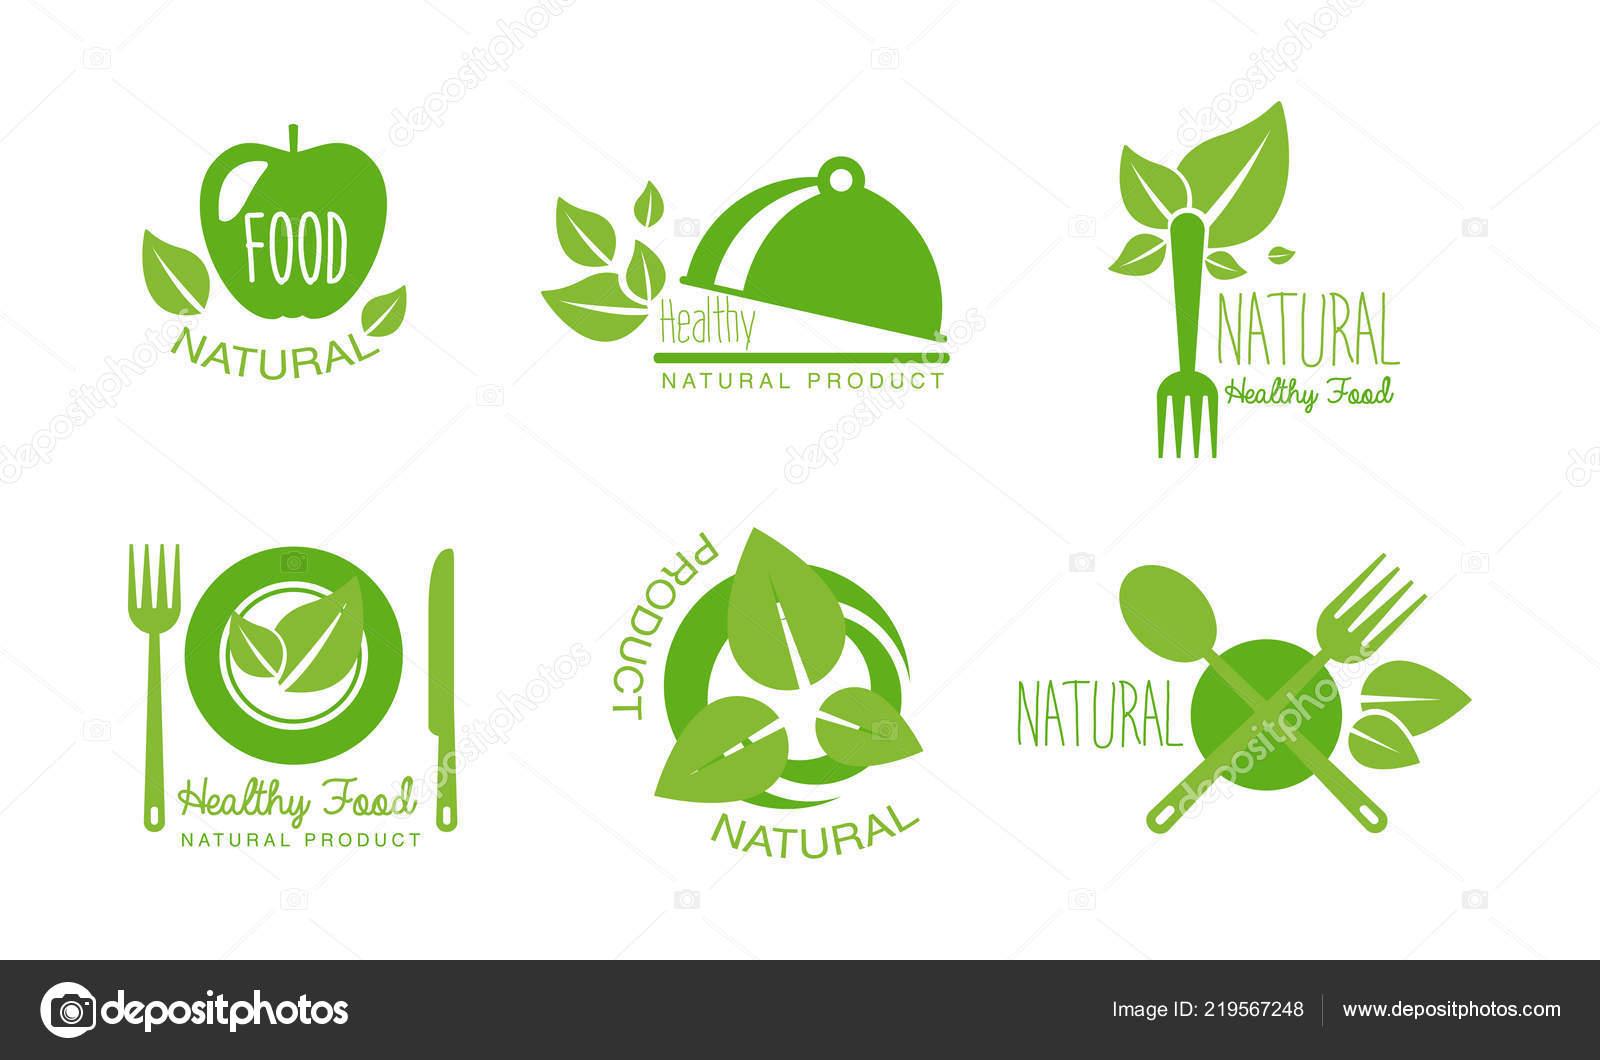 86b84971a5c La valeur de logos des produits naturels sains